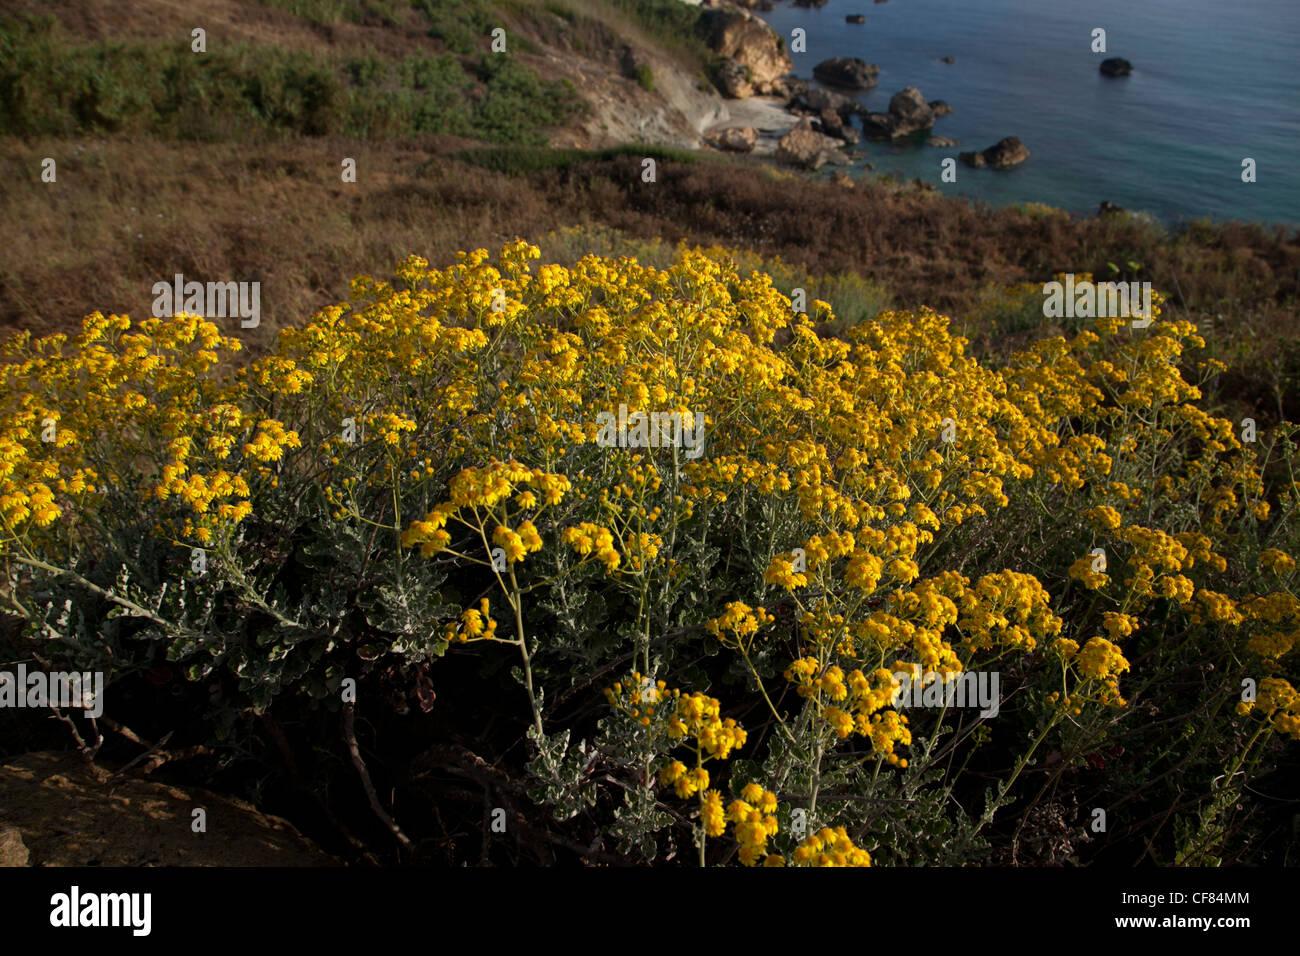 Coastal plant called sea ragwort flower in June in Gozo in Malta. - Stock Image